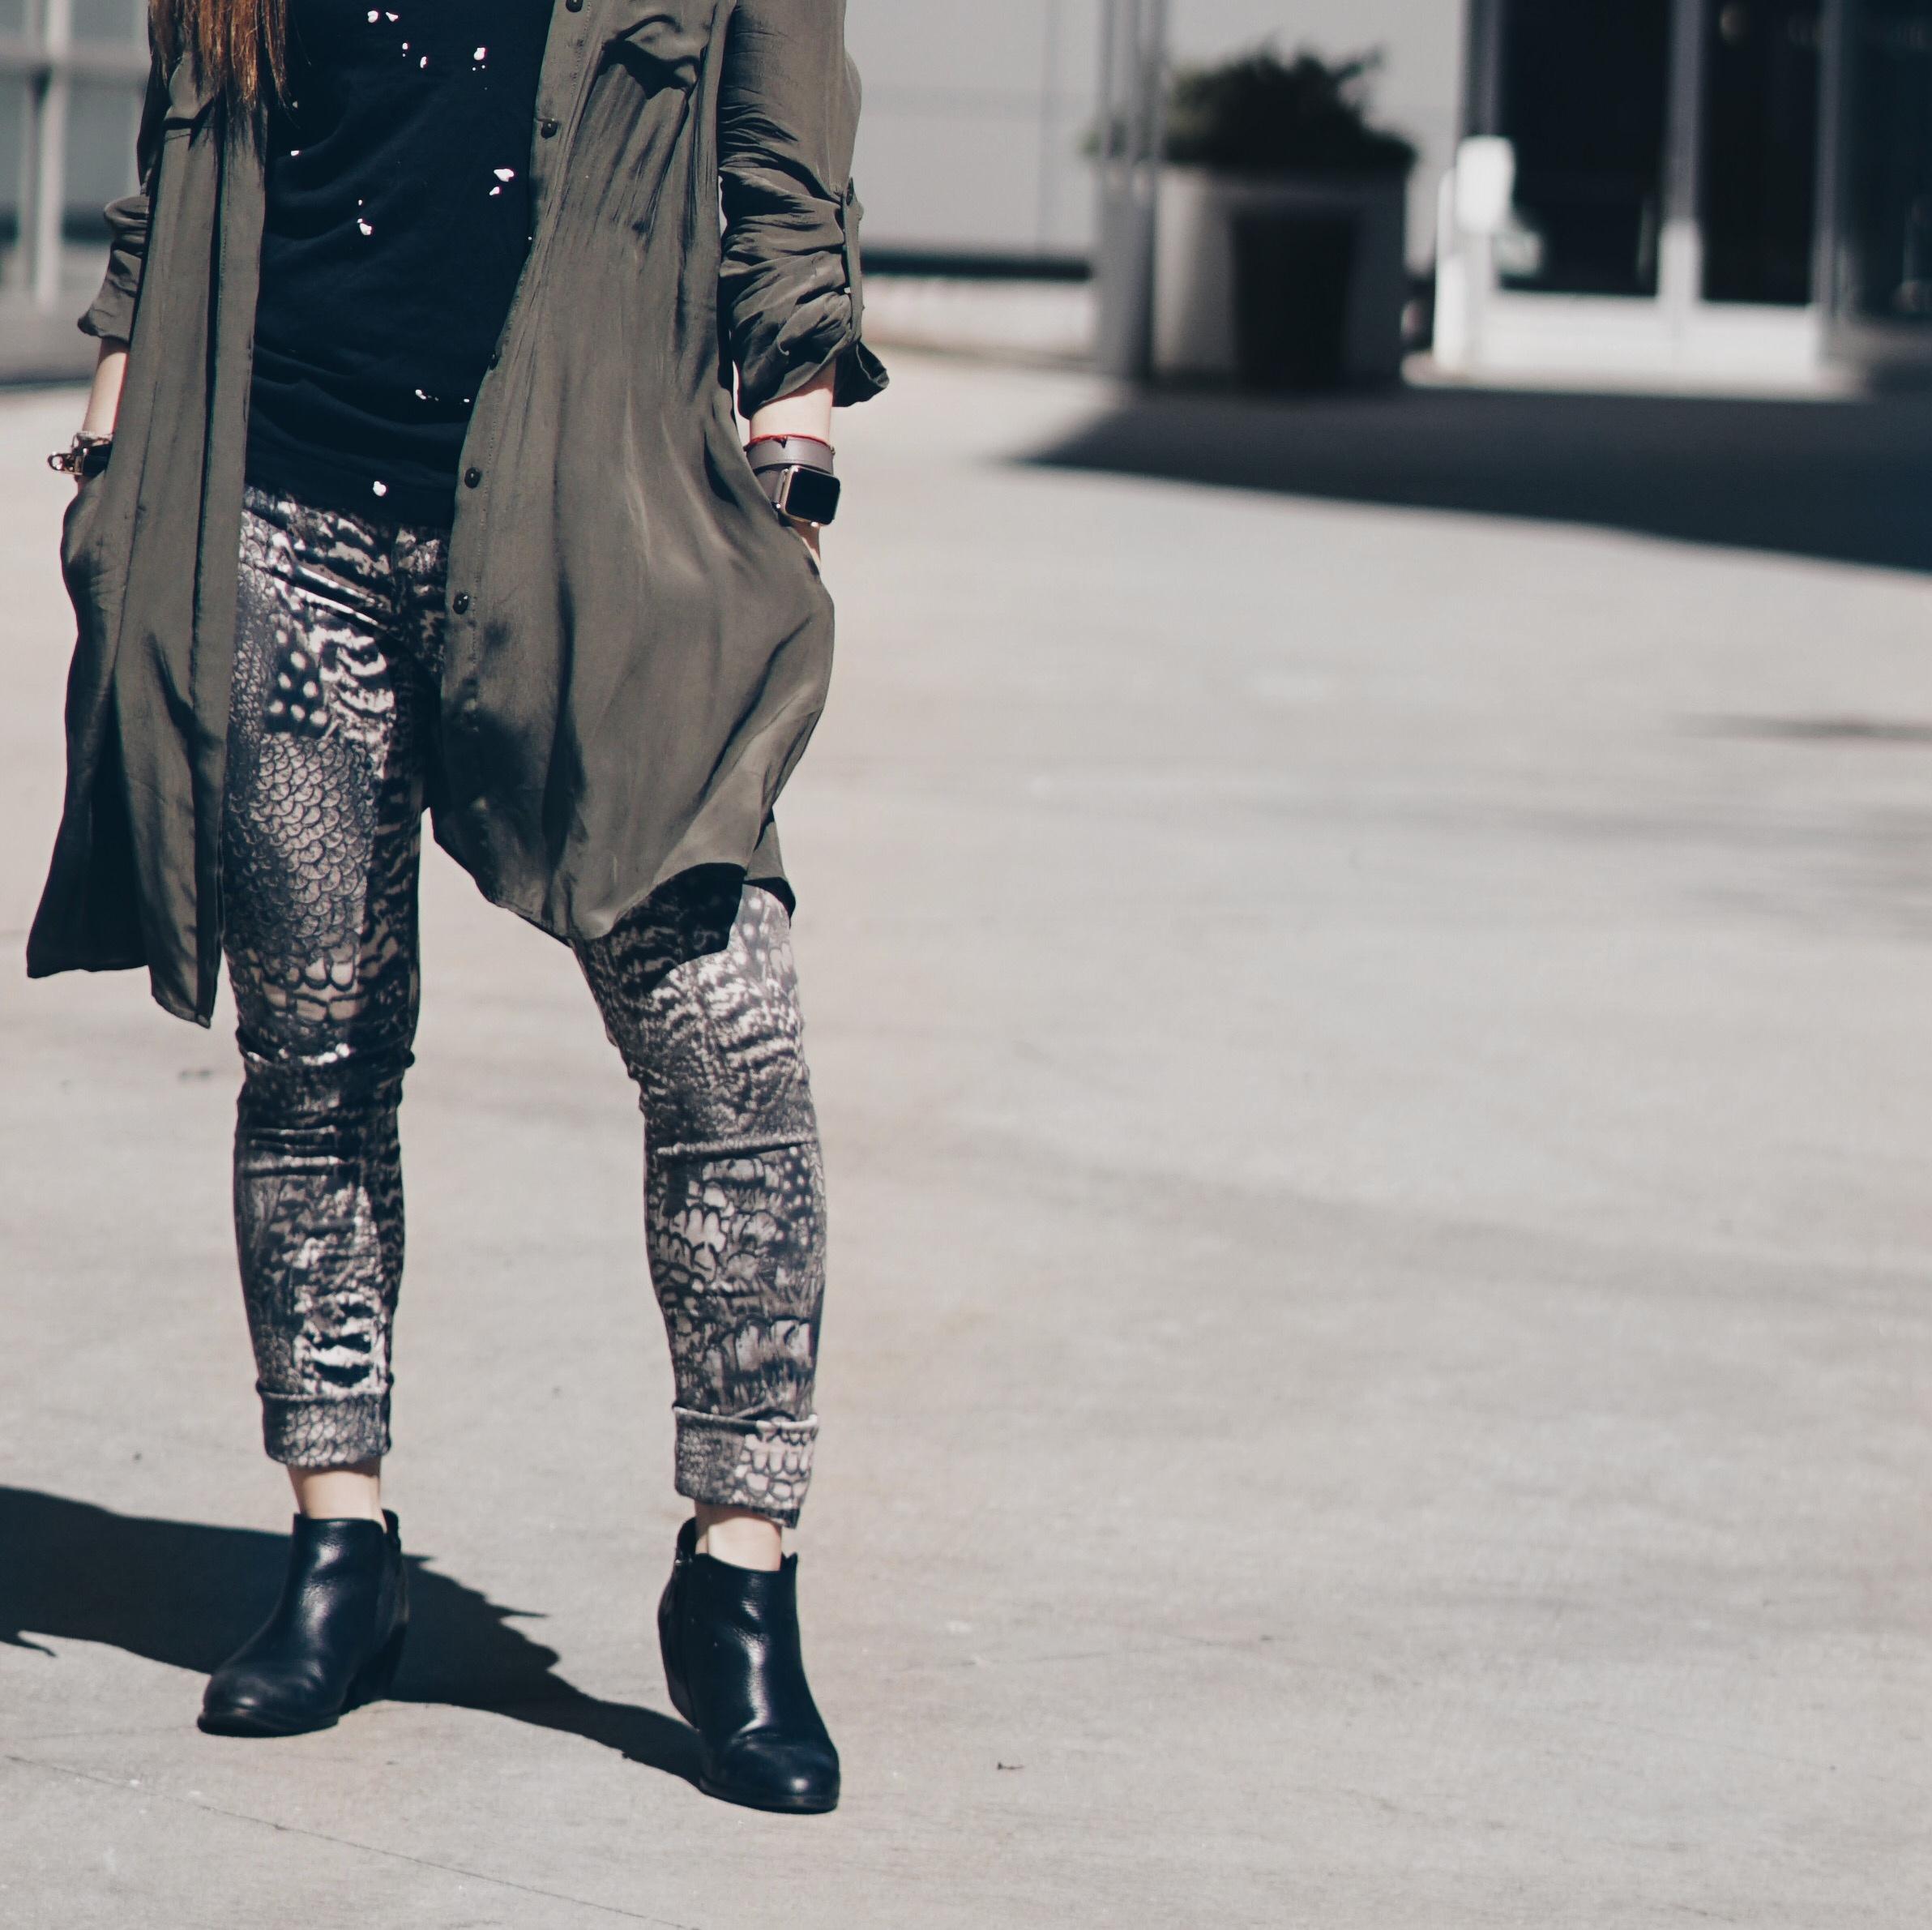 Risa Xu Petite Blogger Outfit